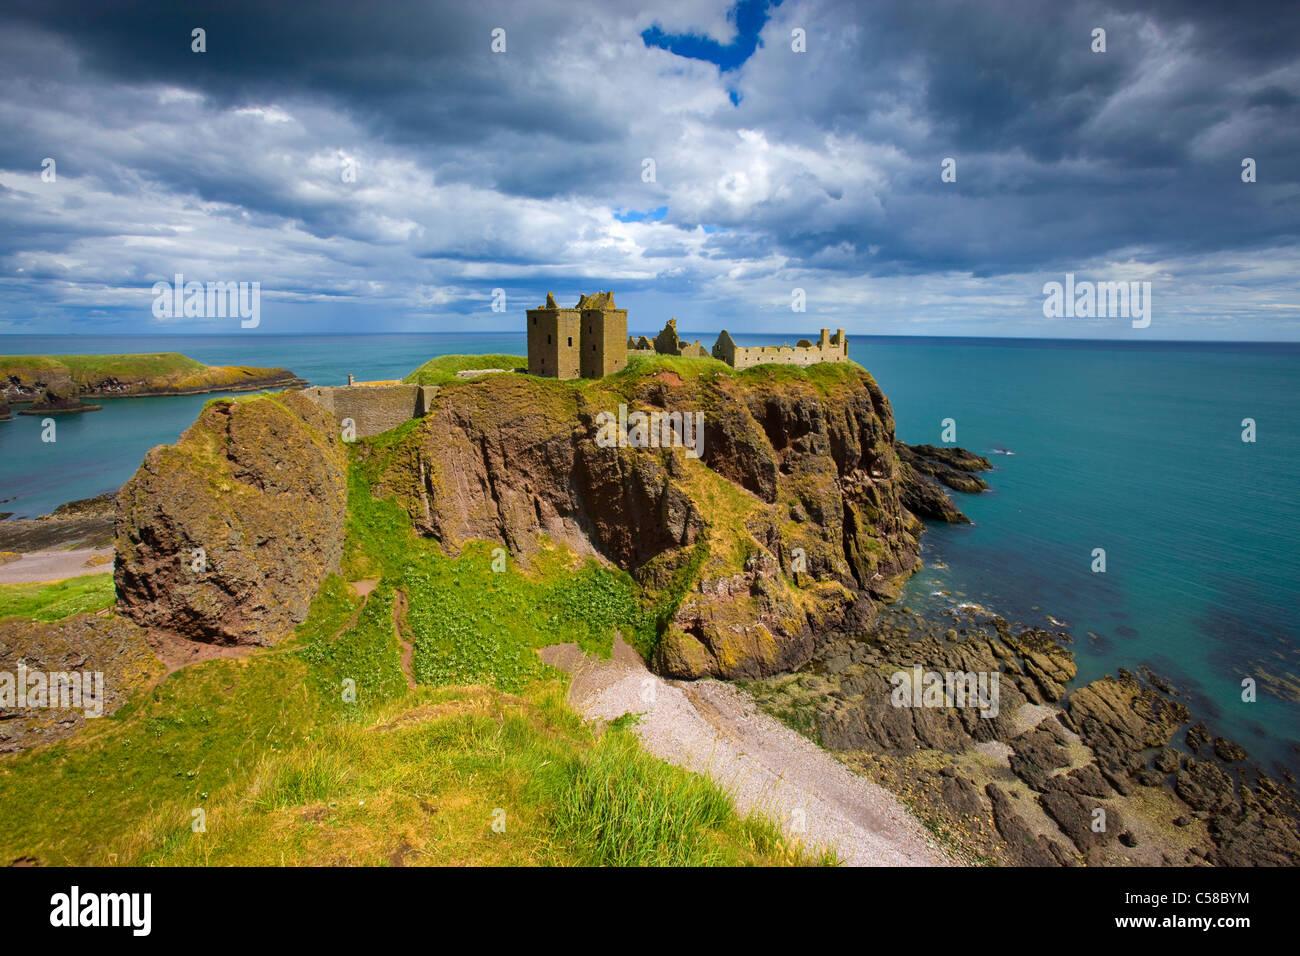 Dunnottar Castle, Great Britain, Scotland, Europe, sea, coast, cliff coast, castle, ruins, clouds - Stock Image